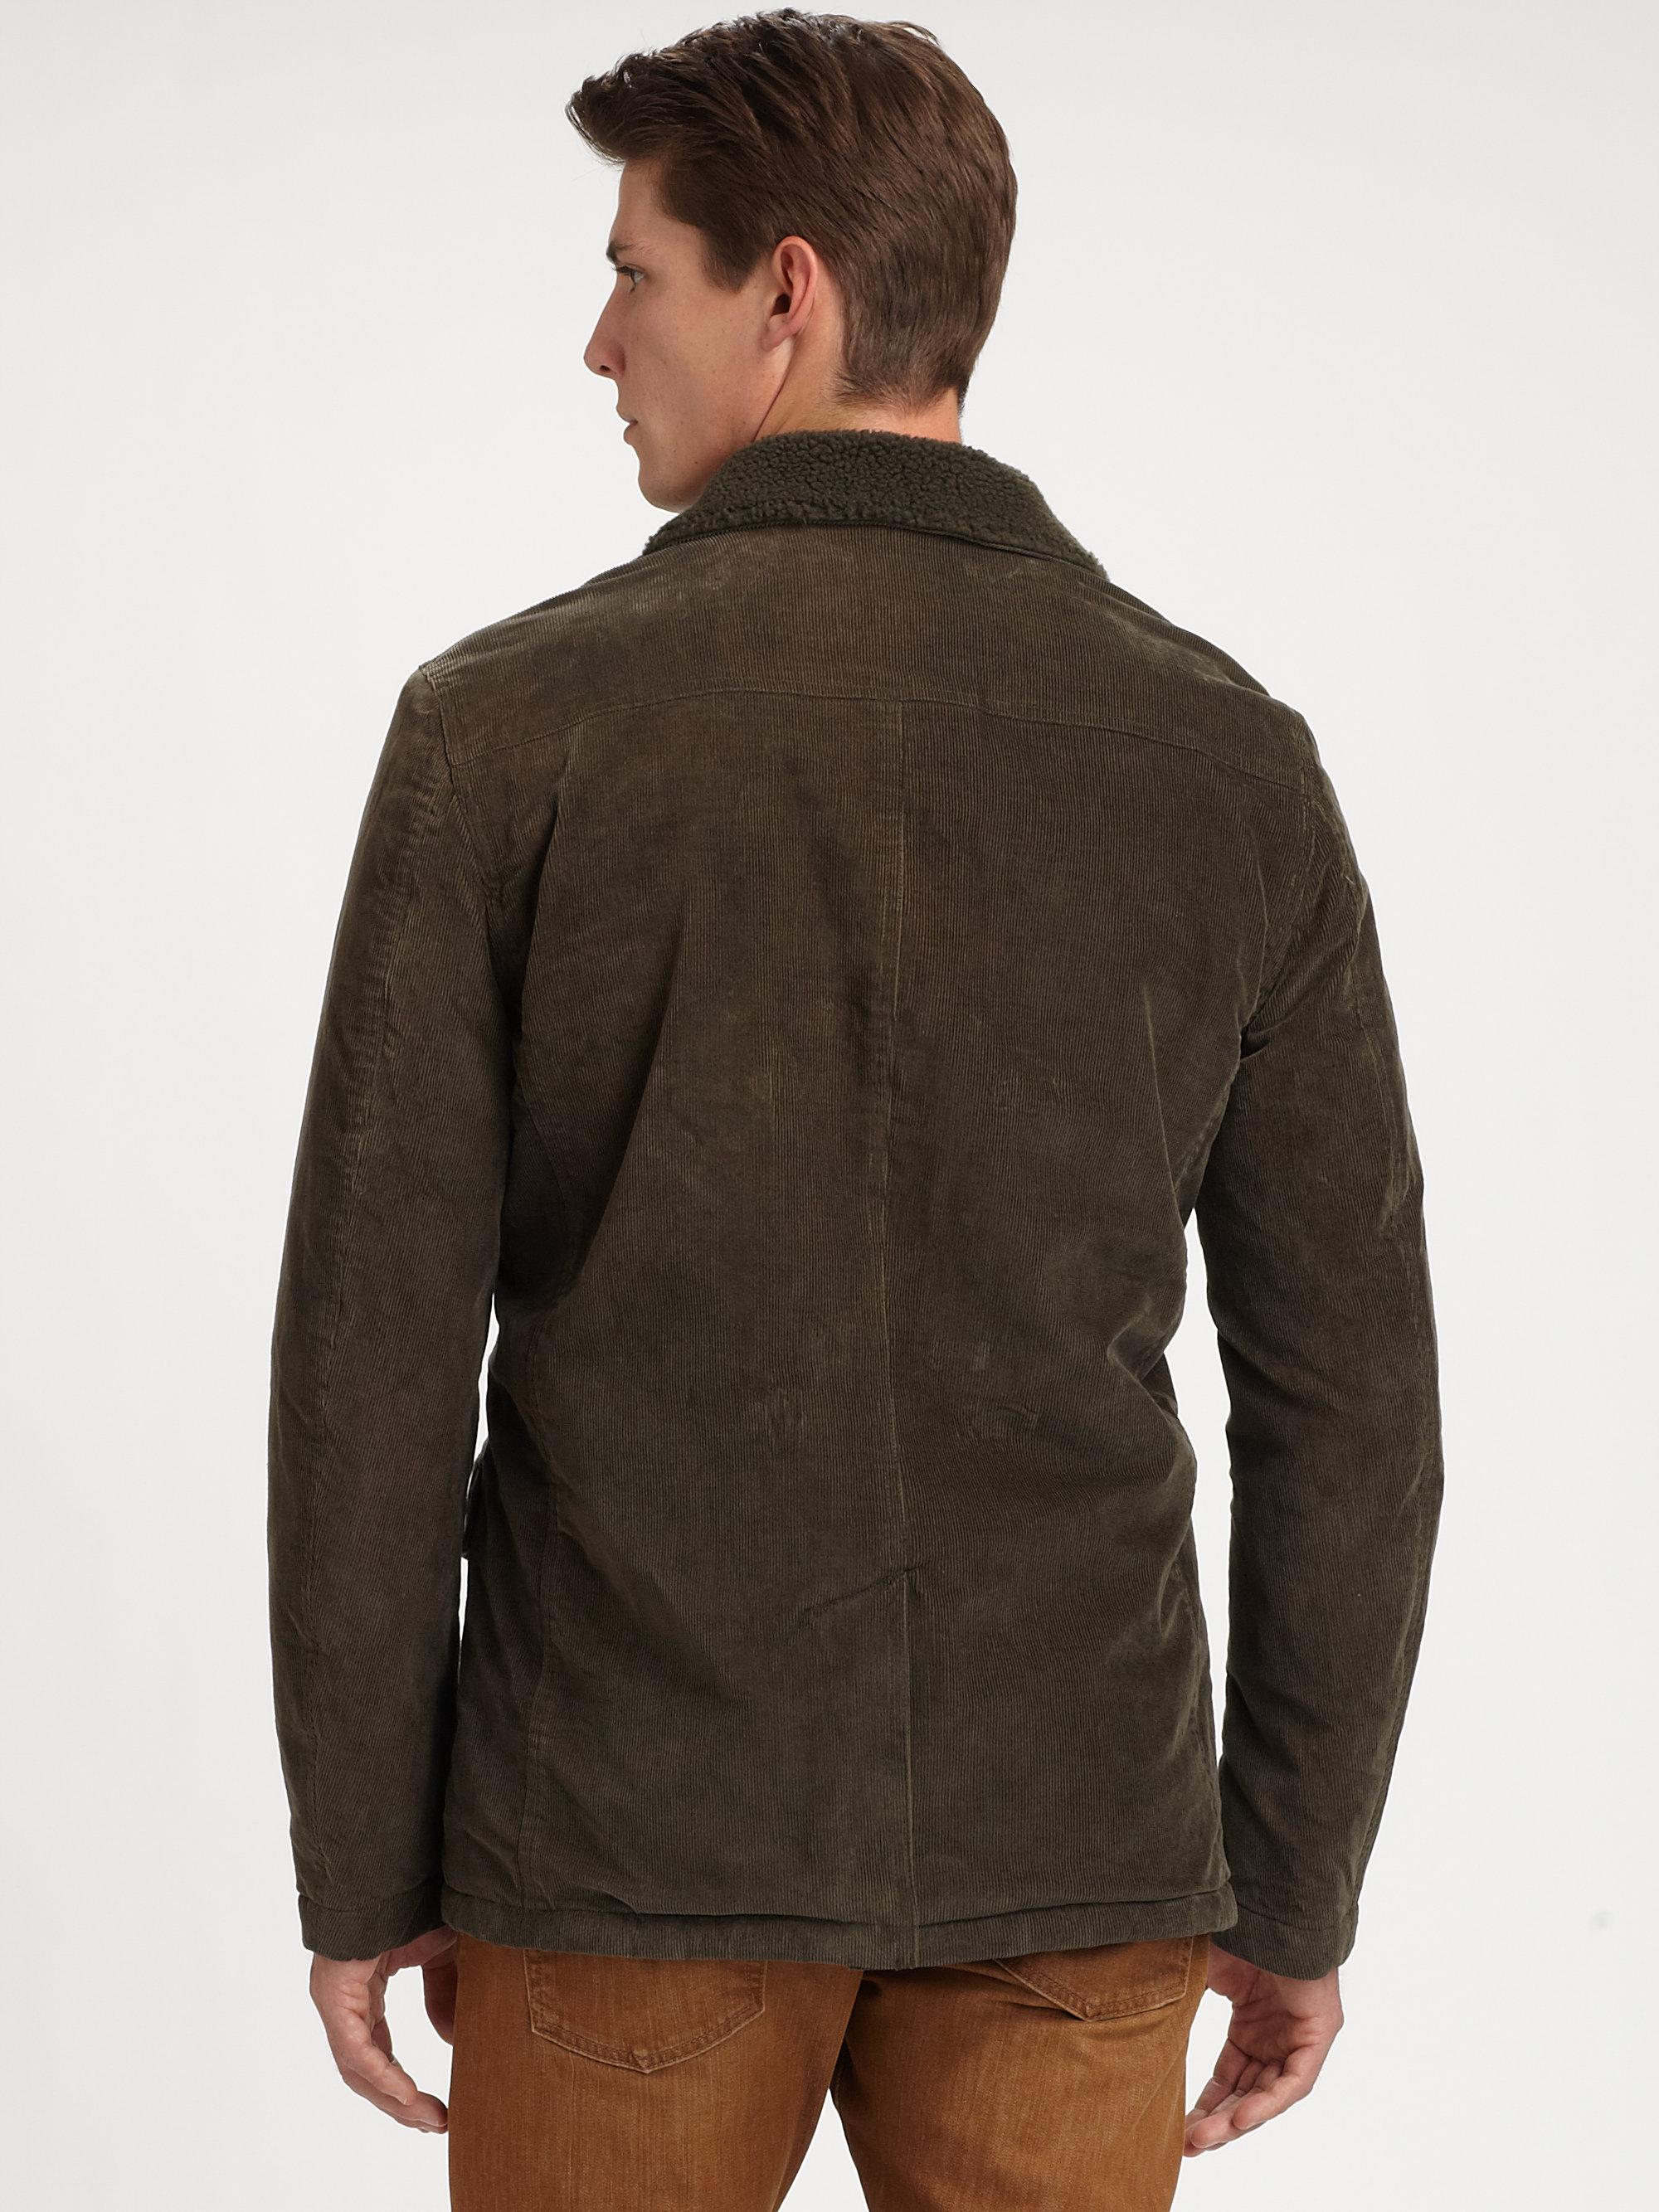 barns beckett us com s barn descente and images var junior apparel juniors product jackets